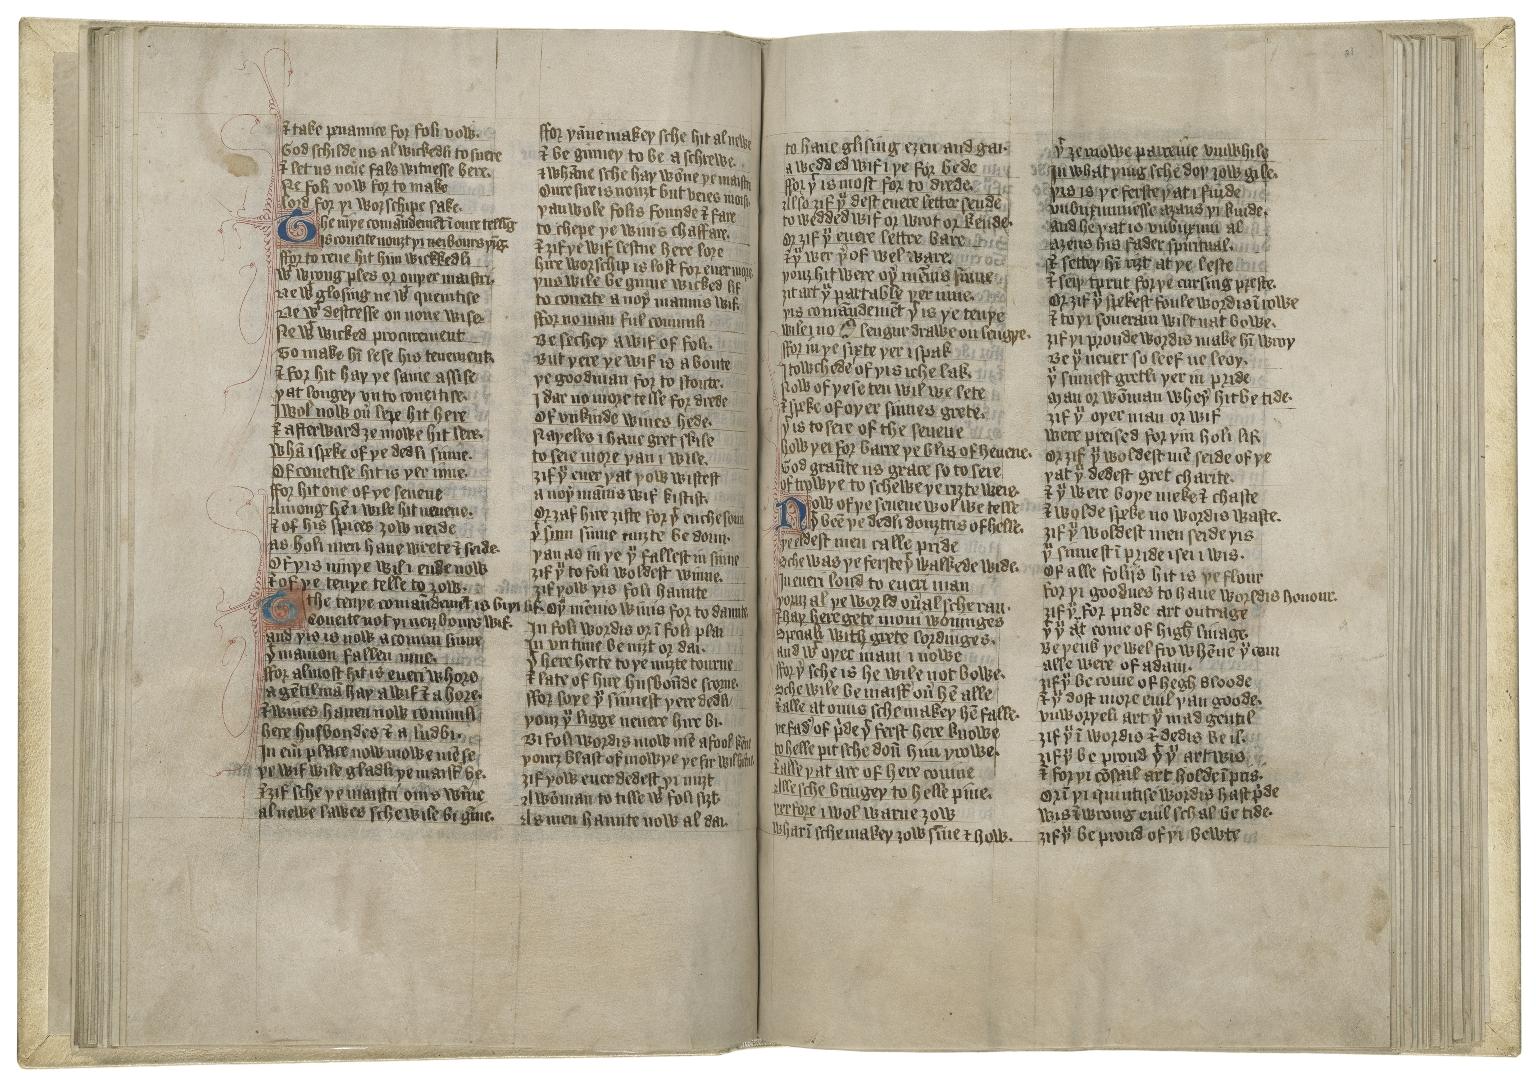 [Handlyng synne] The book called Handelyng off synne, 1303 [manuscript], copy of ca. 1400.